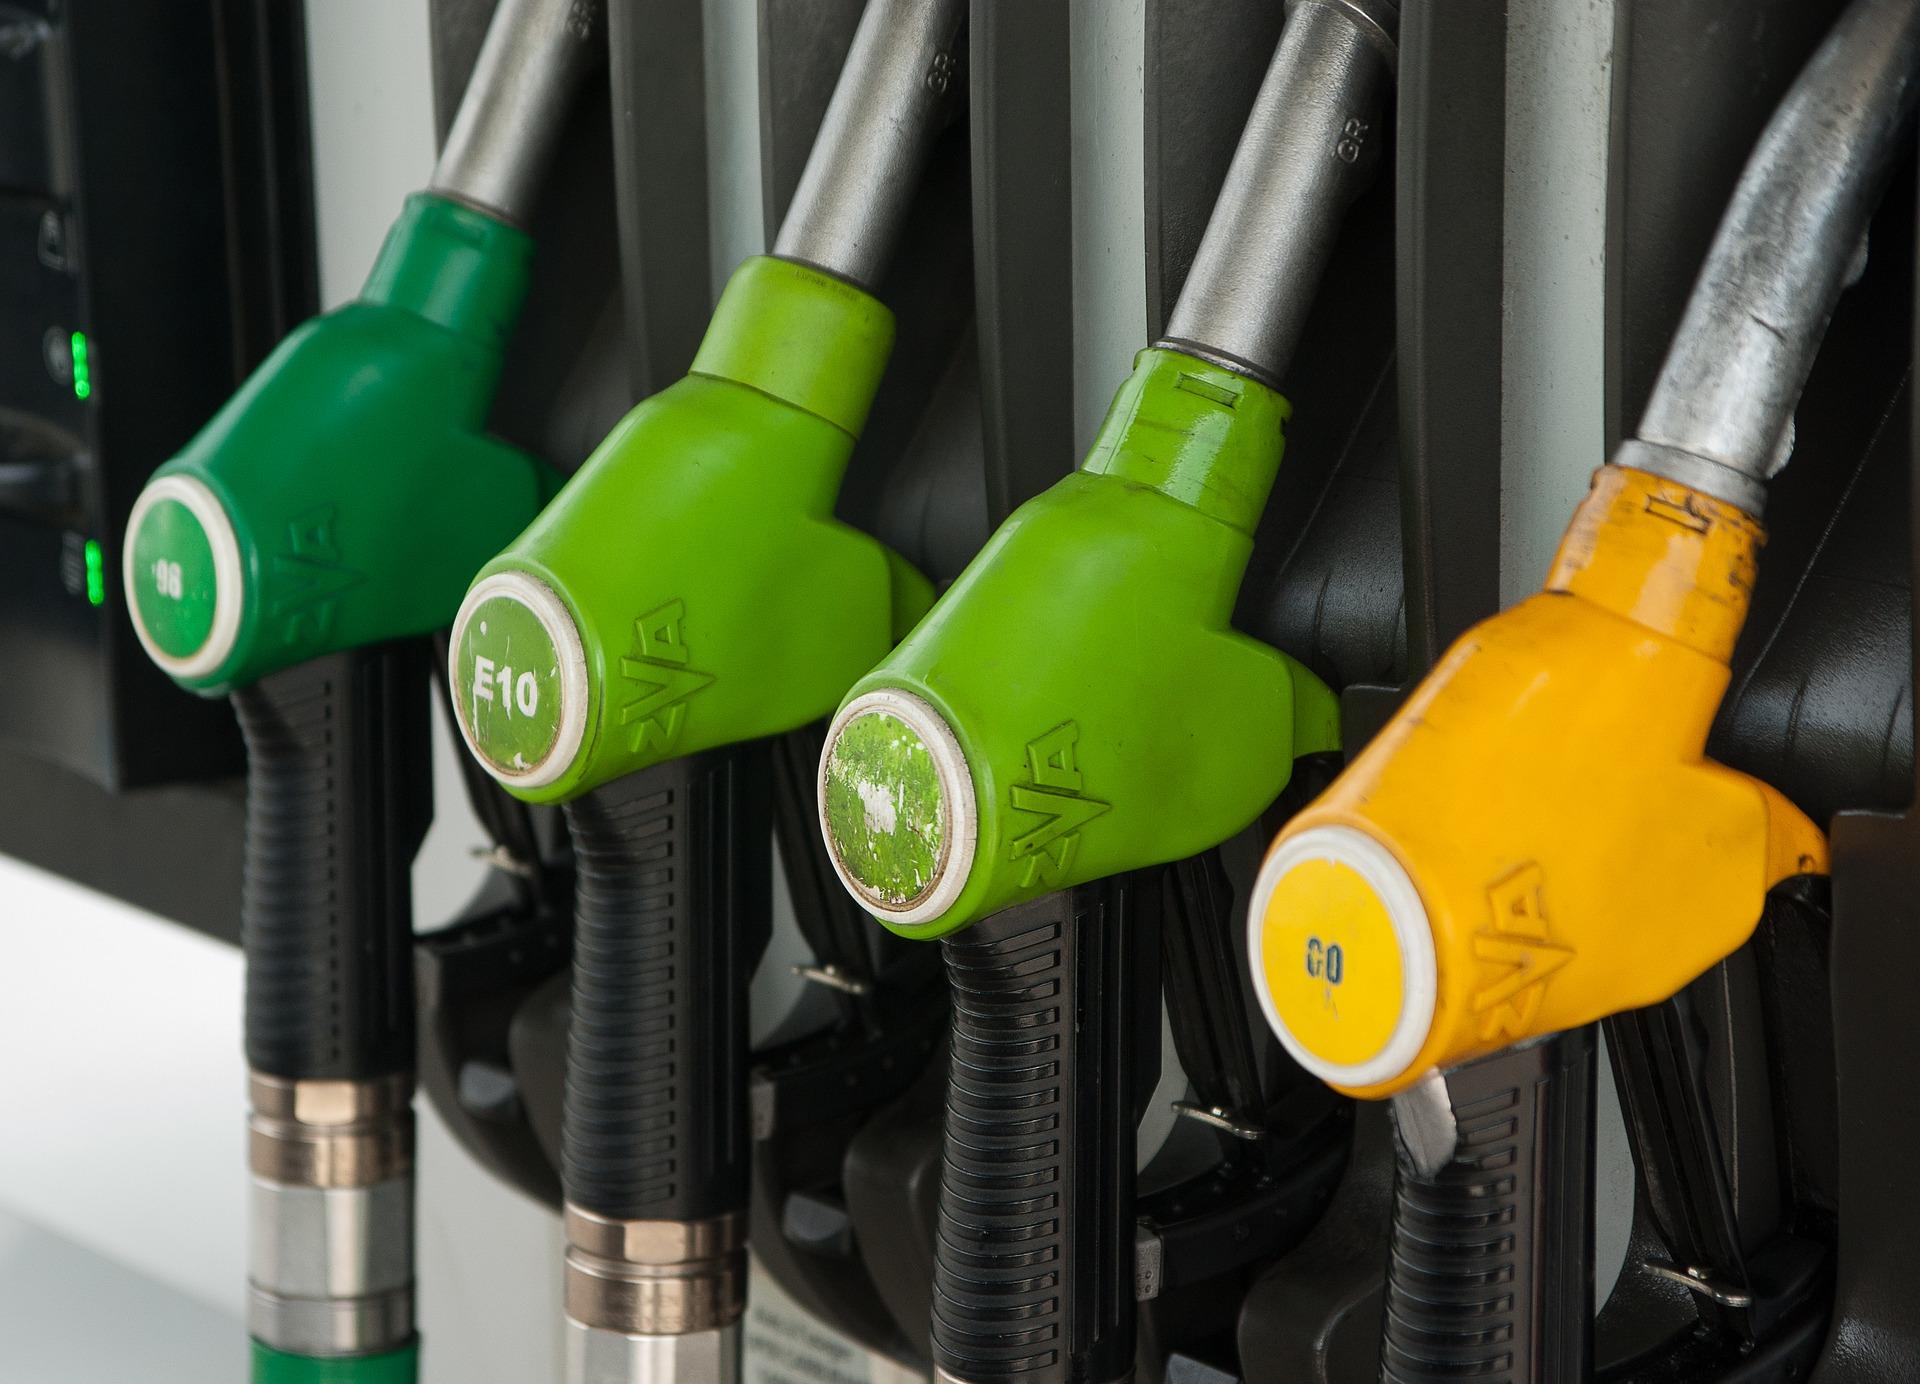 Repostar Gasolina Carretera